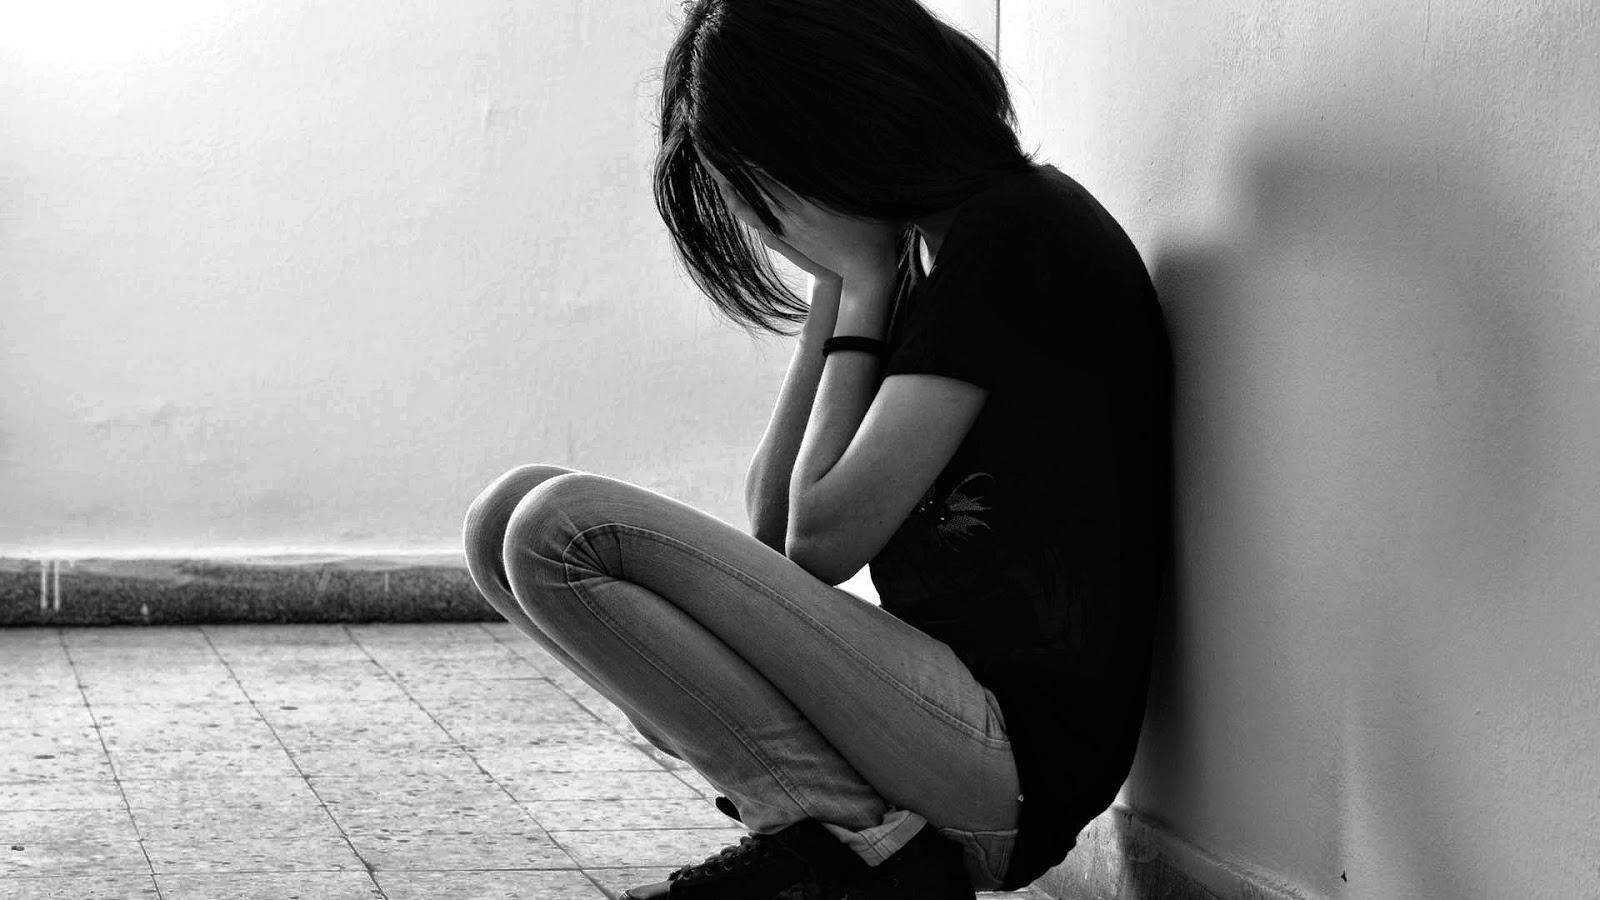 Depression: Feel Free from Depression, -  மனச்சோர்விலிருந்து விடுபடுங்கள் - டிப்ரசன் - தகவல்கள், ஆலோசனை & சிகிச்சை மையம்,வேளச்சேரி,  சென்னை